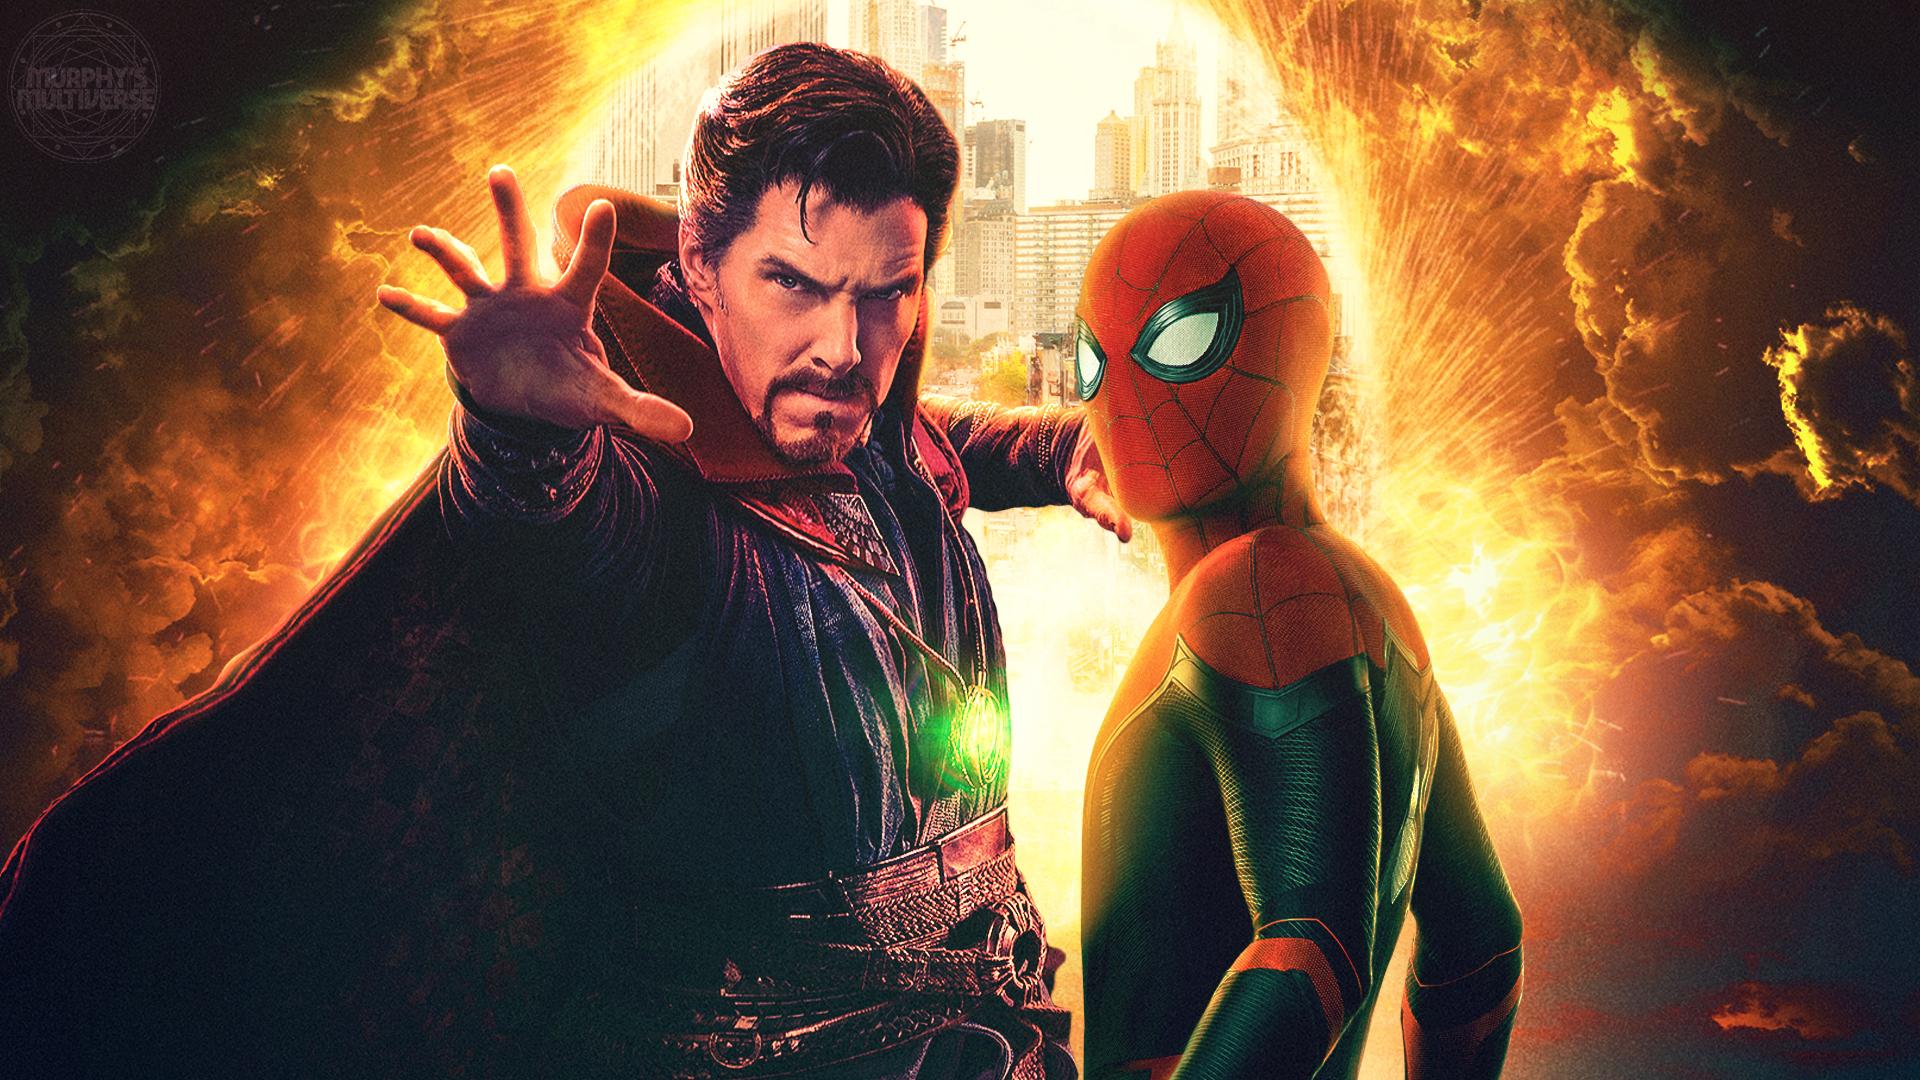 trailer di spider-man no way home - dr strange